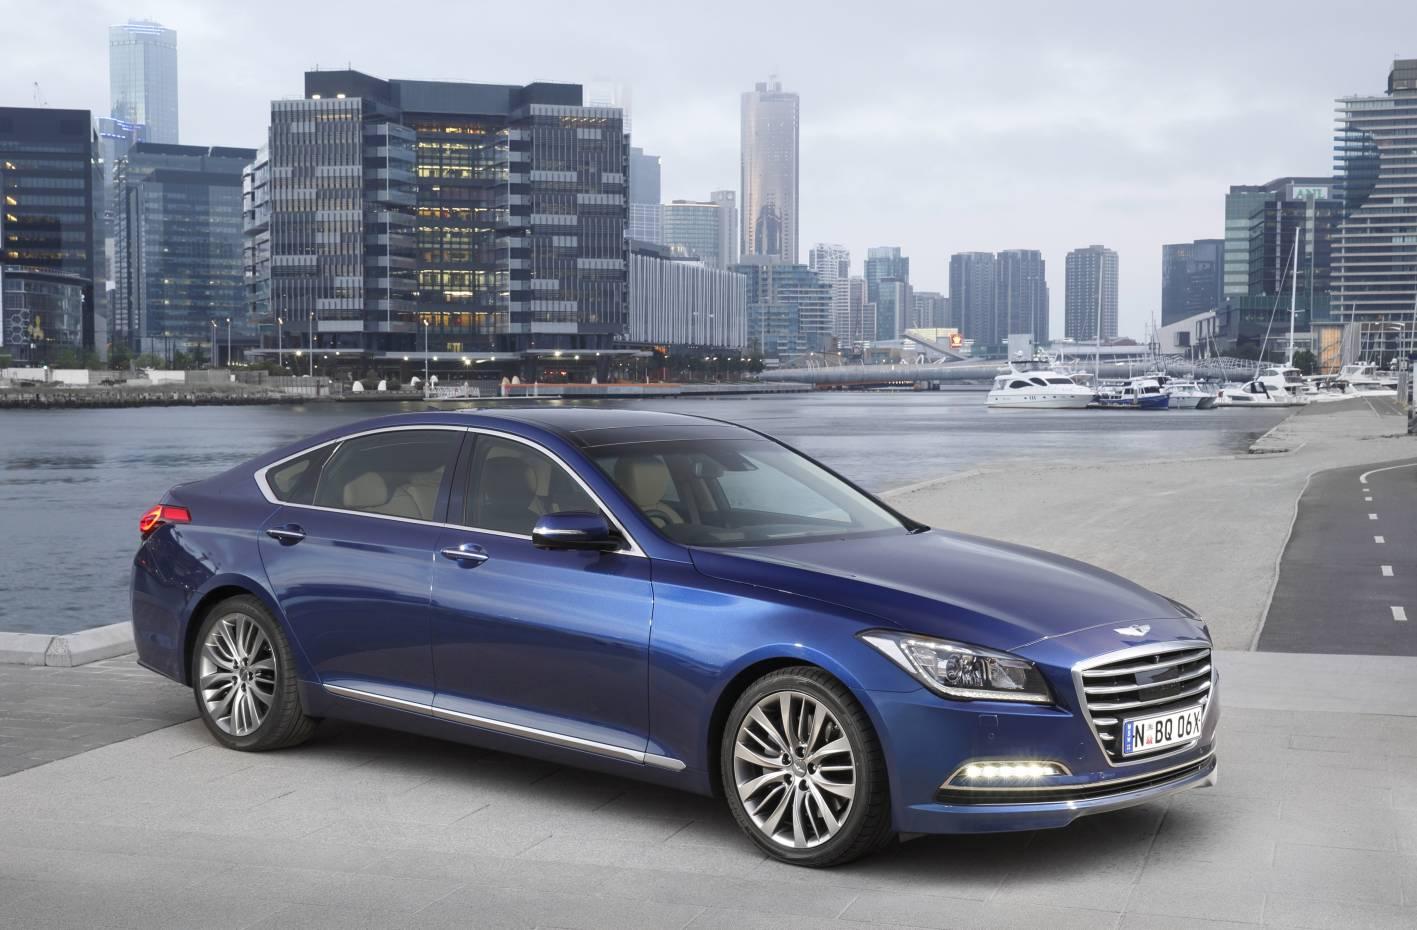 Hyundai Cars News Flagship Rear Drive Genesis On Sale